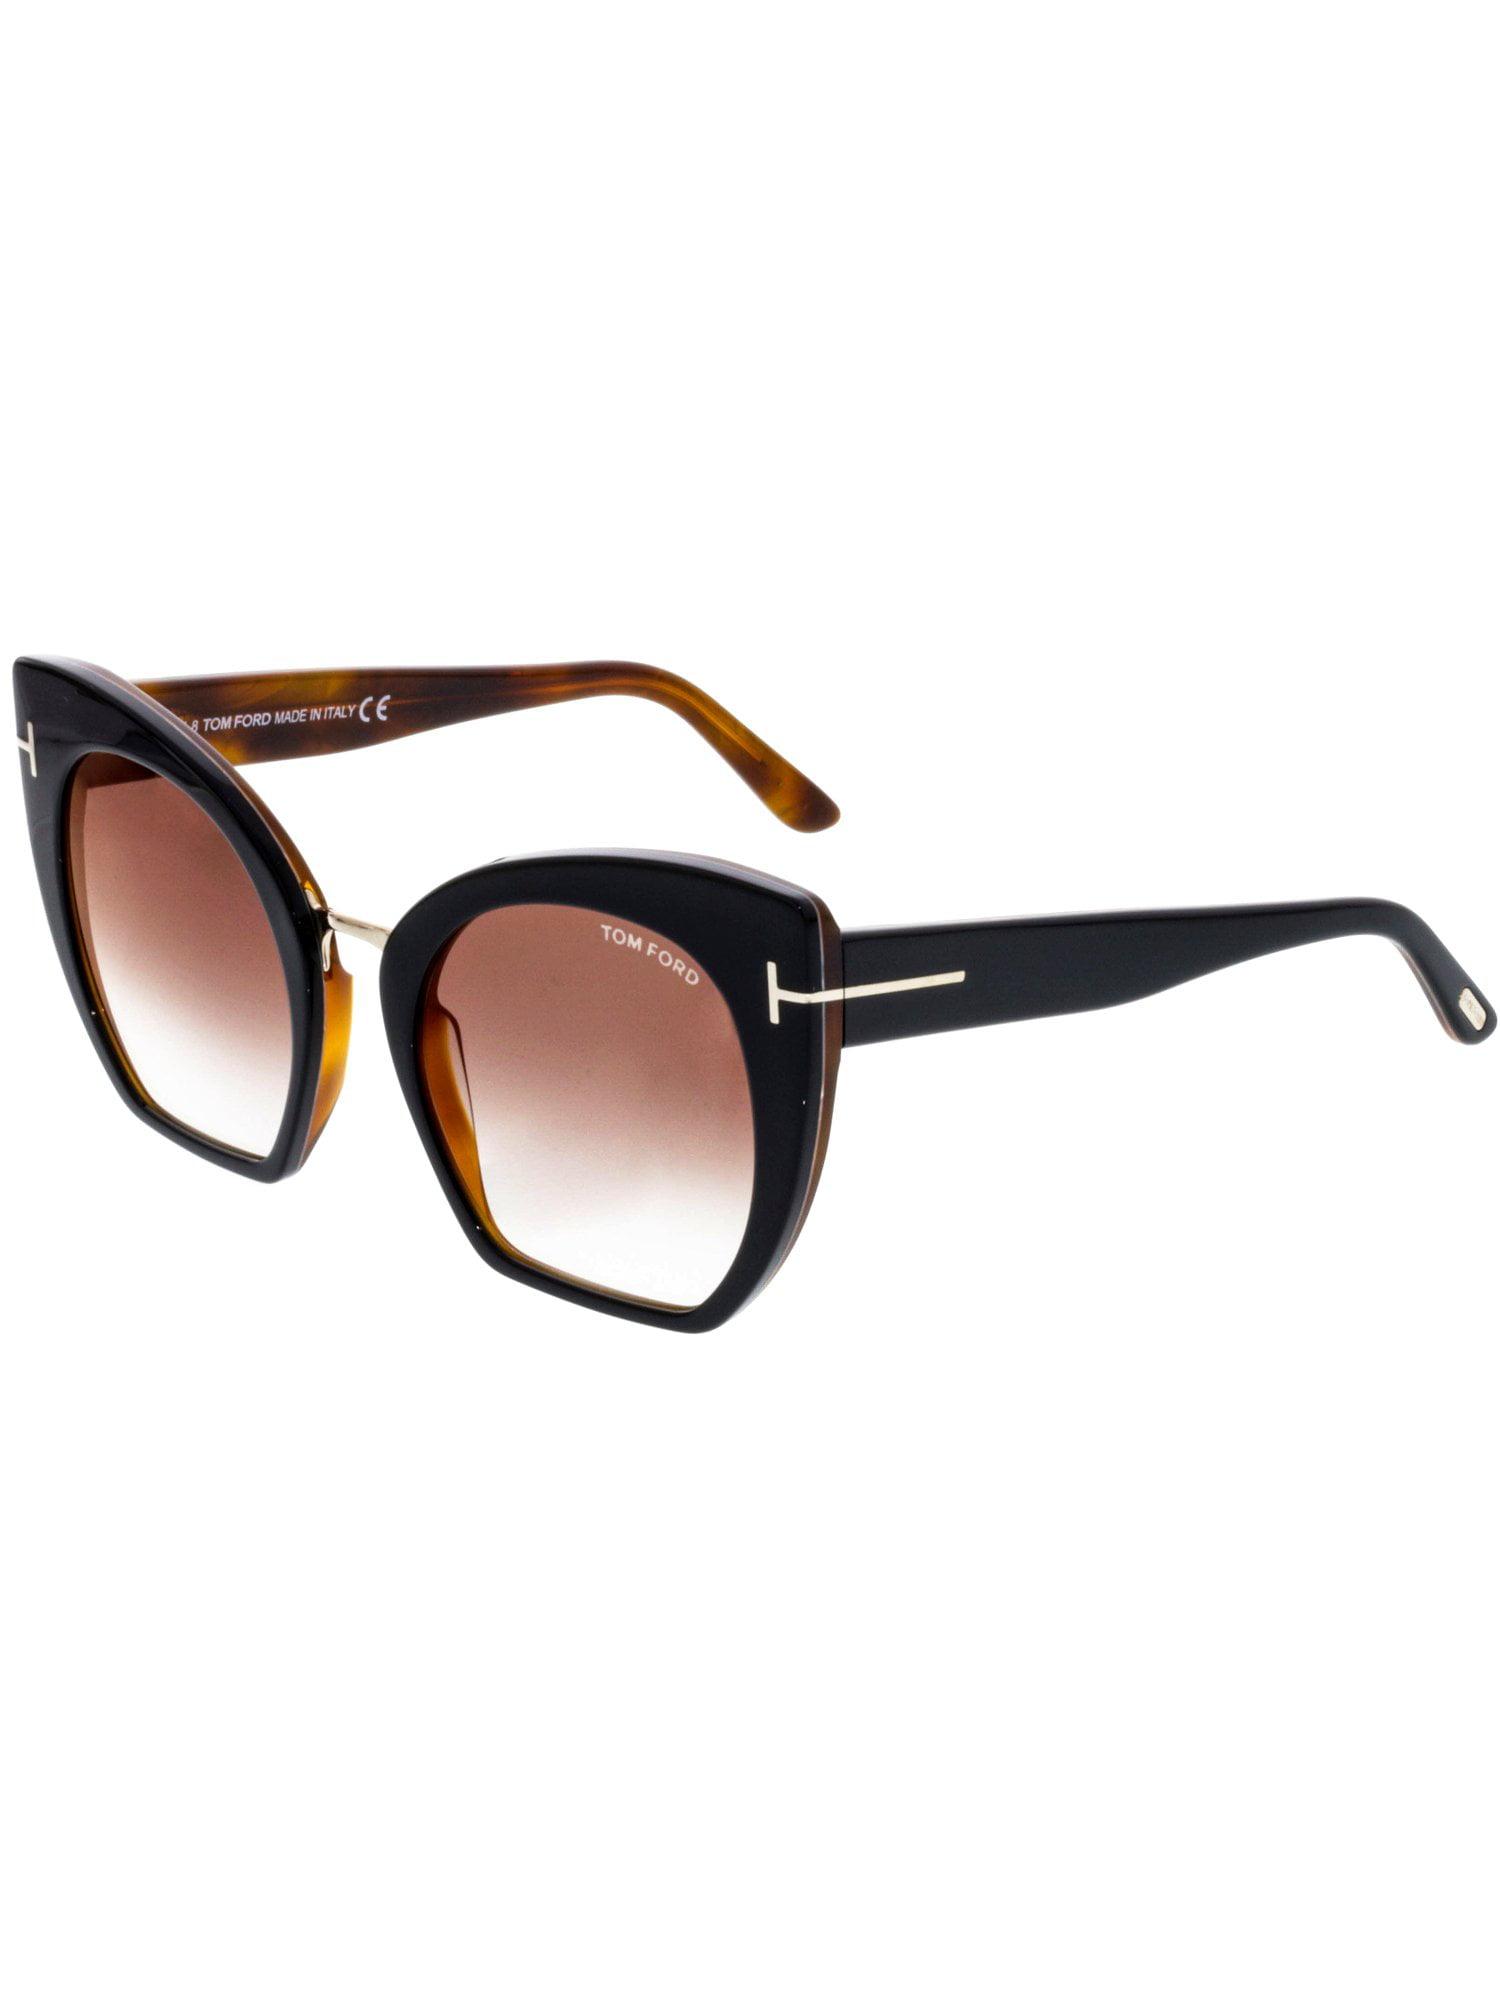 ef8e5616508 Tom Ford - Tom Ford Women s Gradient Samantha FT0553-05U-55 Black Cat Eye  Sunglasses - Walmart.com